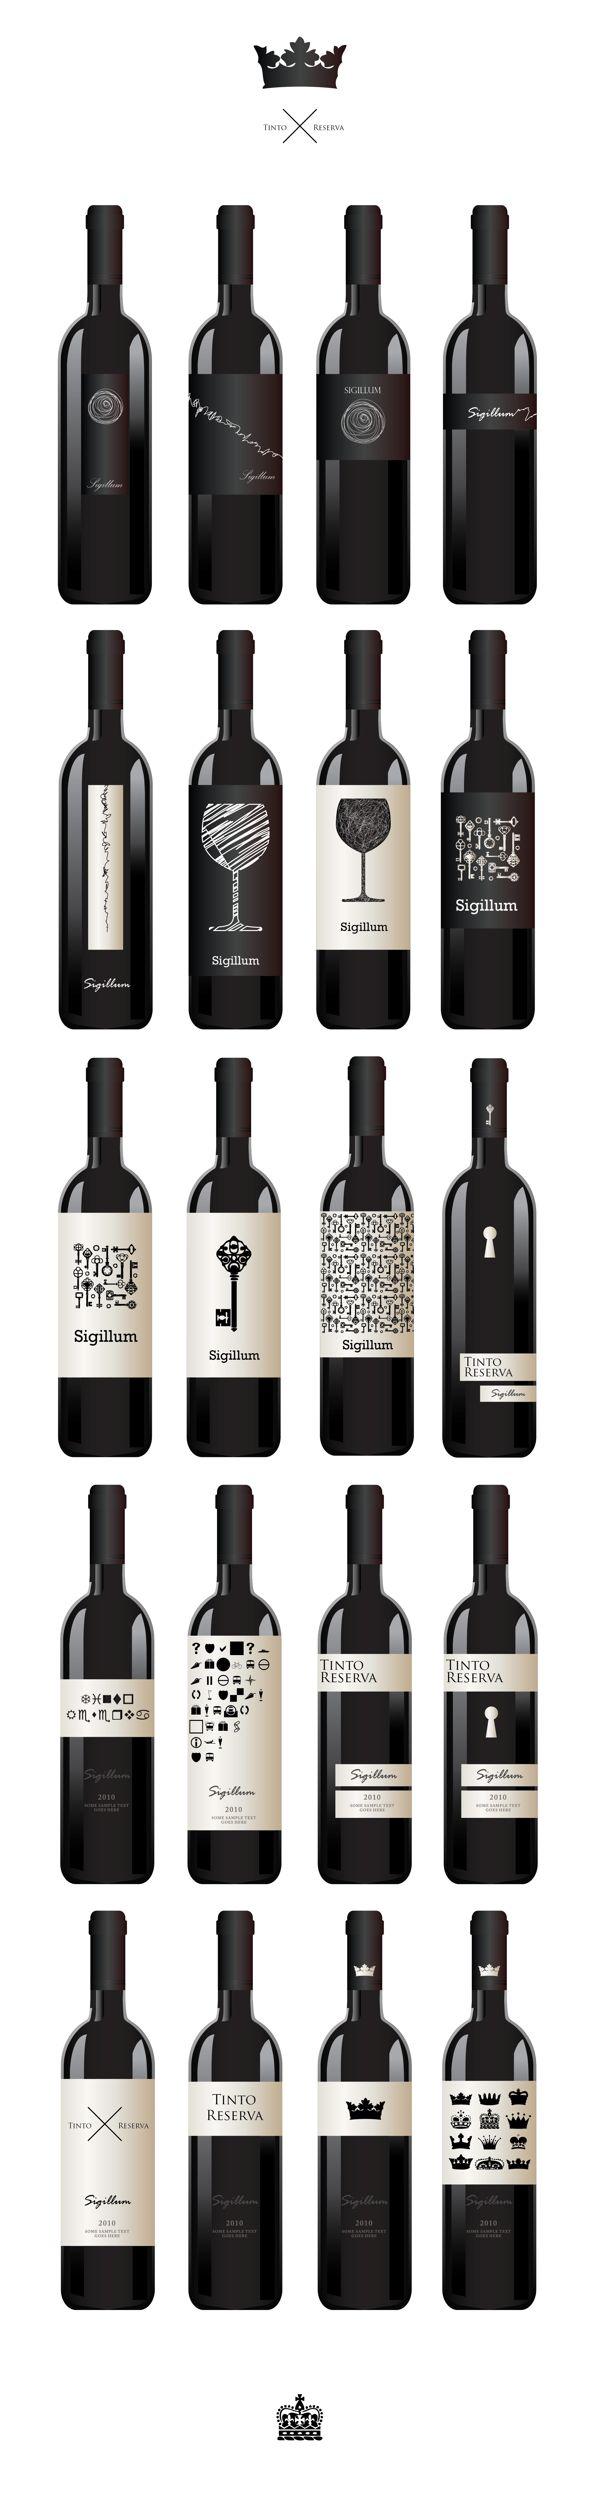 бренд Sigillum, República Portuguesa by Дмитрий Ерофеев, via Behance. A lot of great #wine #bottle designs in this one pin PD